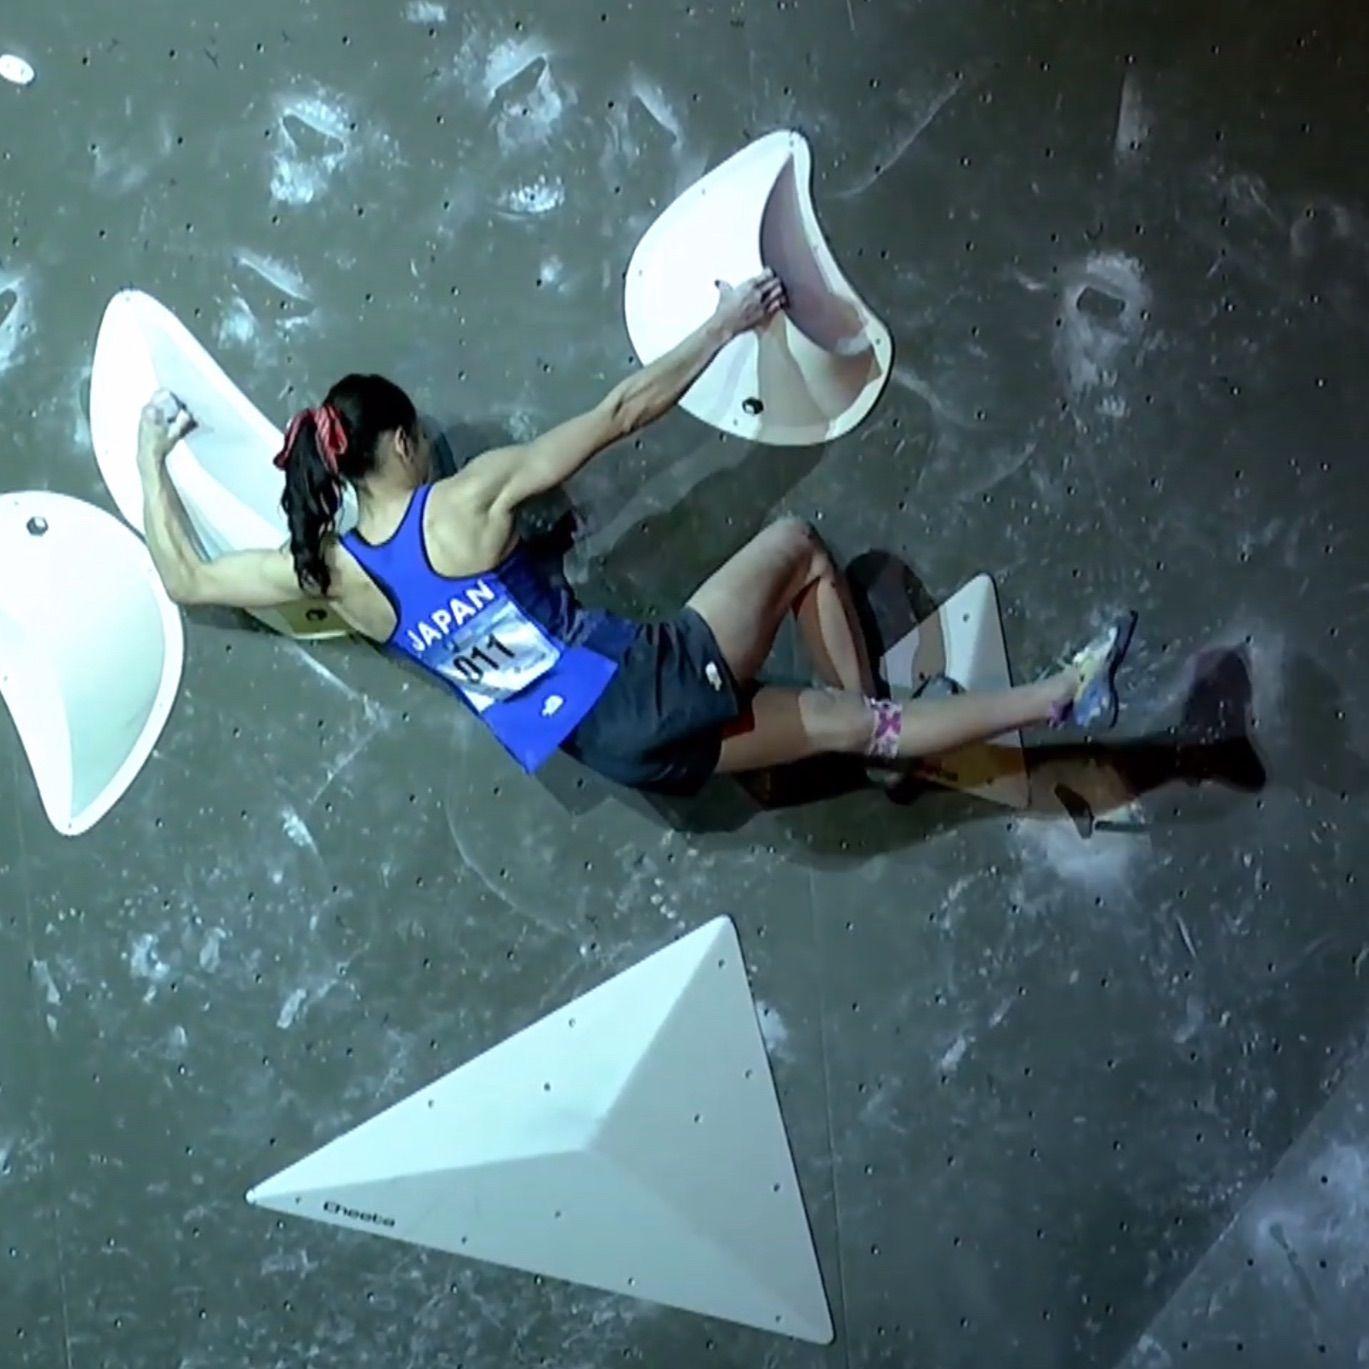 The Road to 2020 Olympics w John Burgman of Climbing Magazine